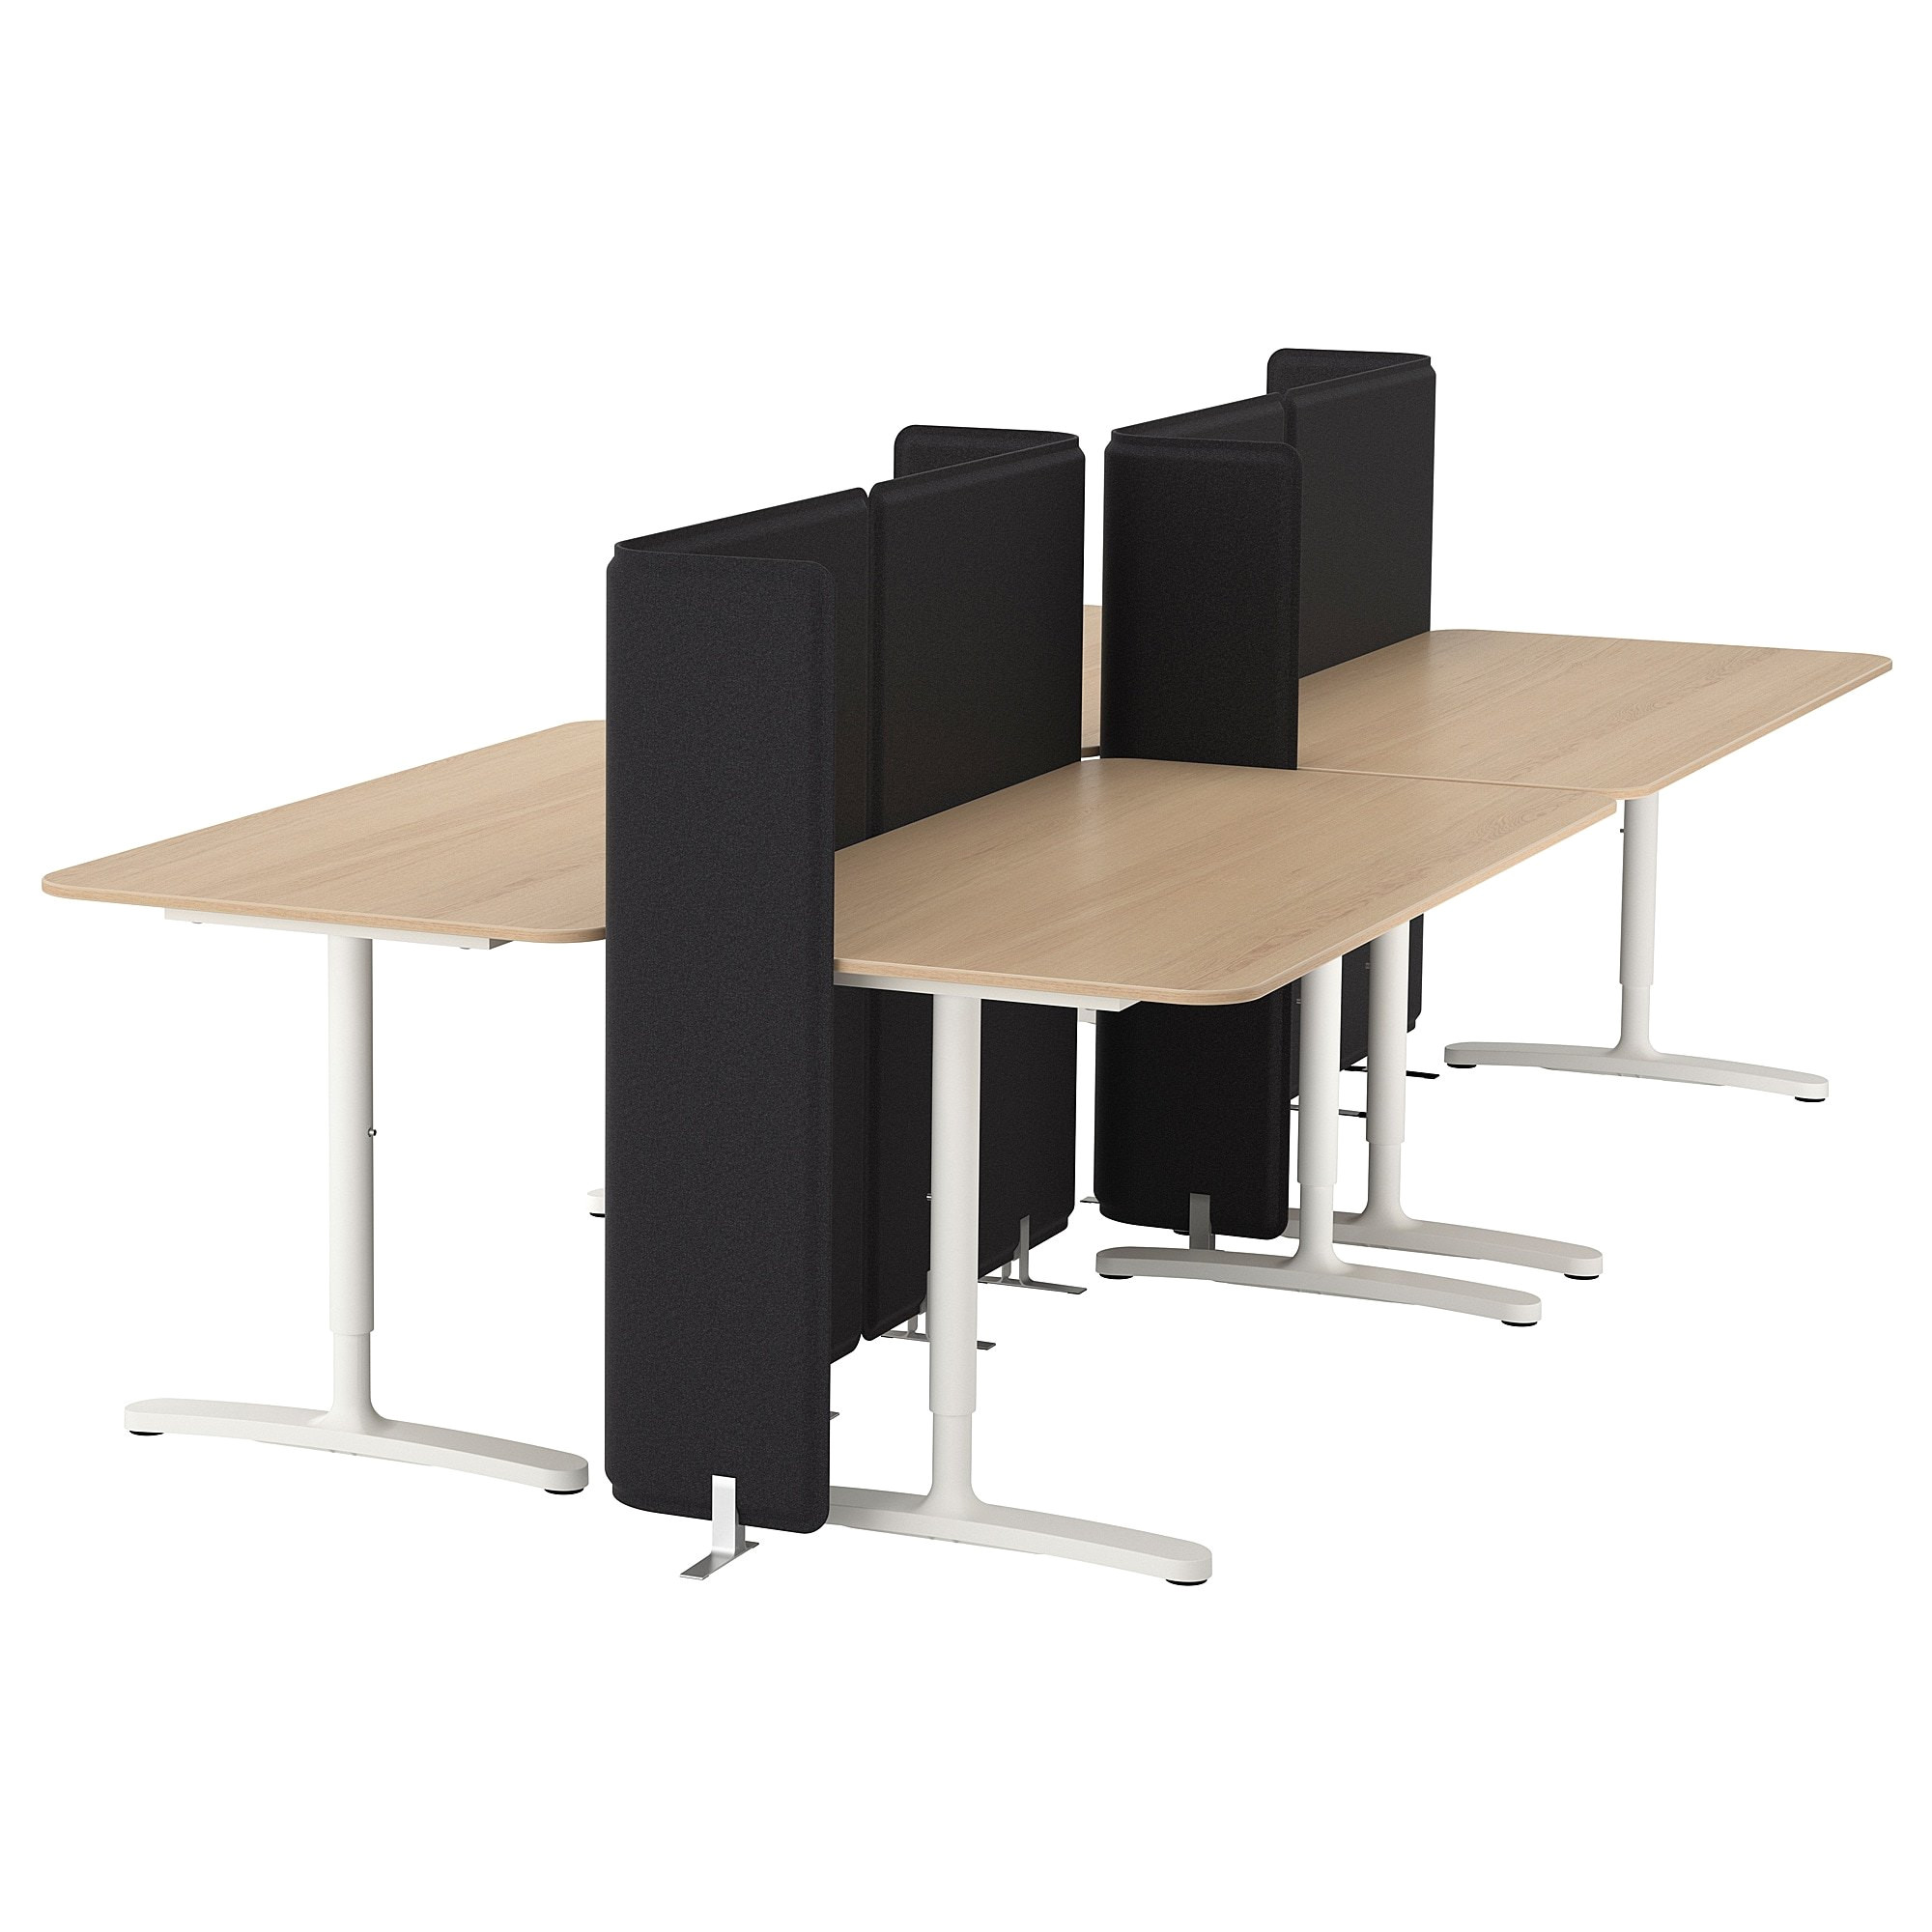 Ikea Galant Left Corner Desk Assembly Instructions Bureau